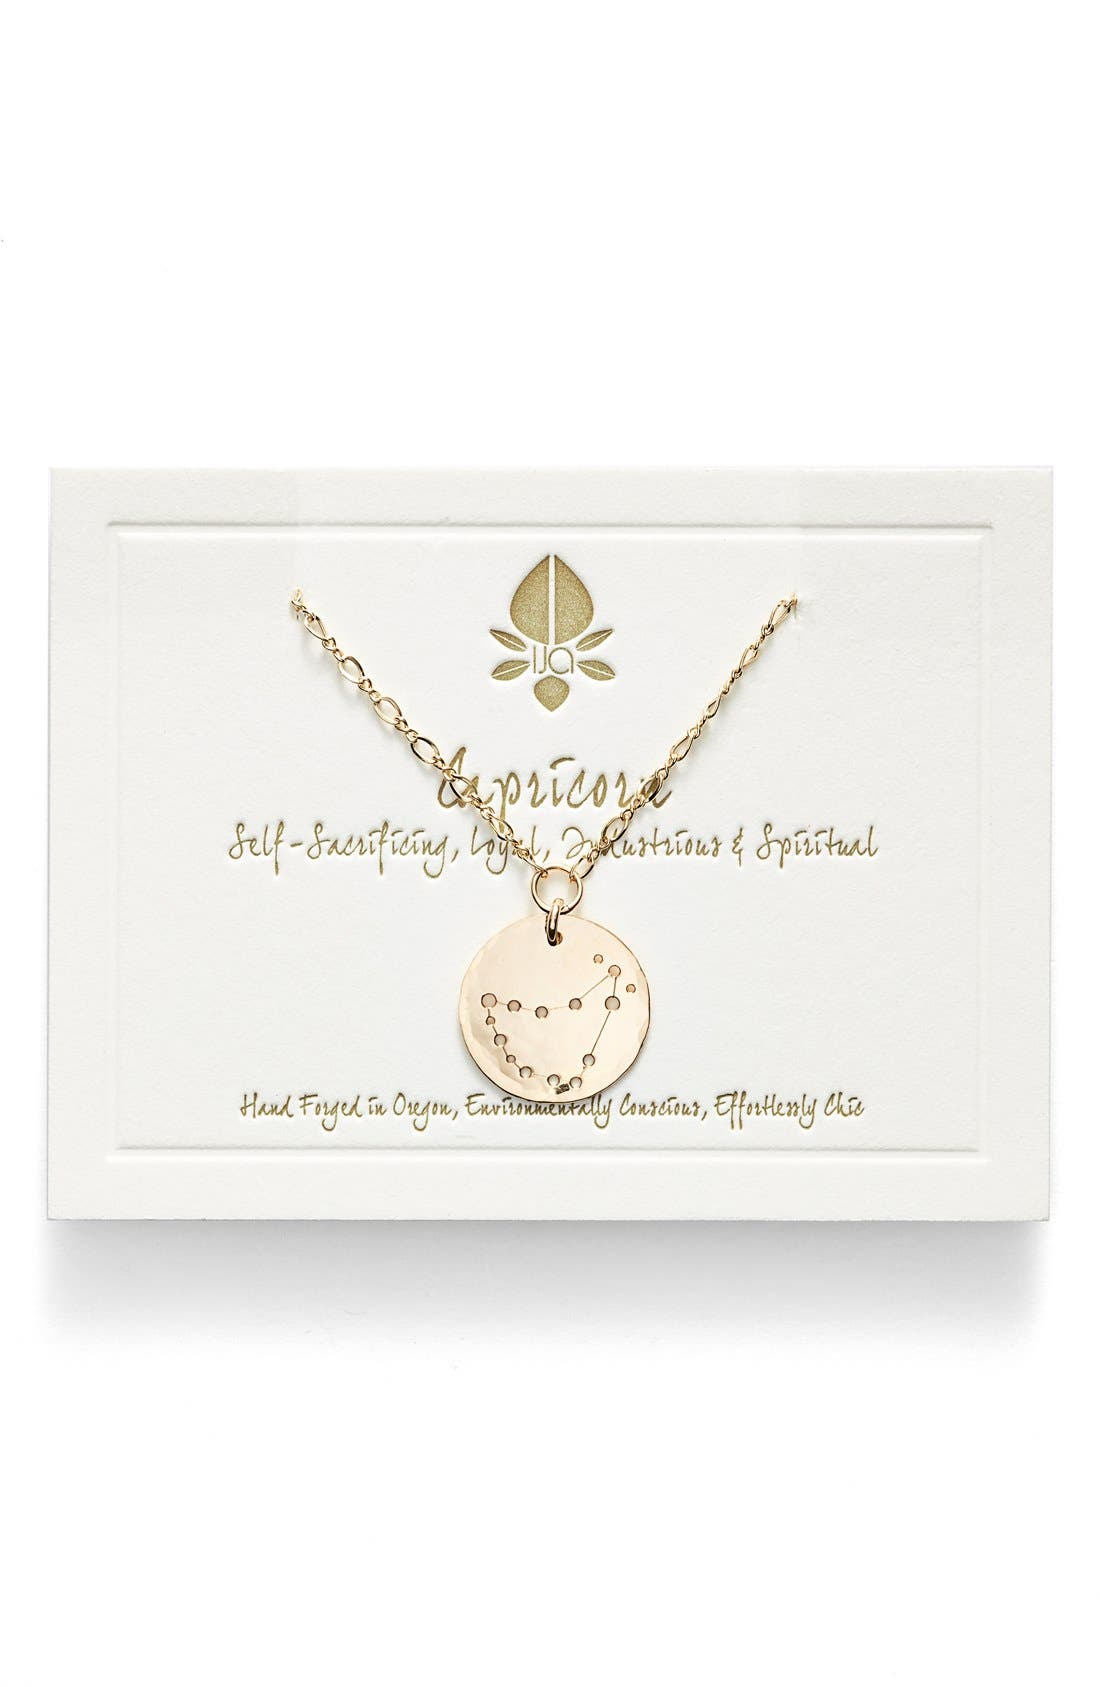 Ija 'Large Zodiac' 14k-Gold Fill Necklace,                         Main,                         color, 14K Gold Fill Capricorn